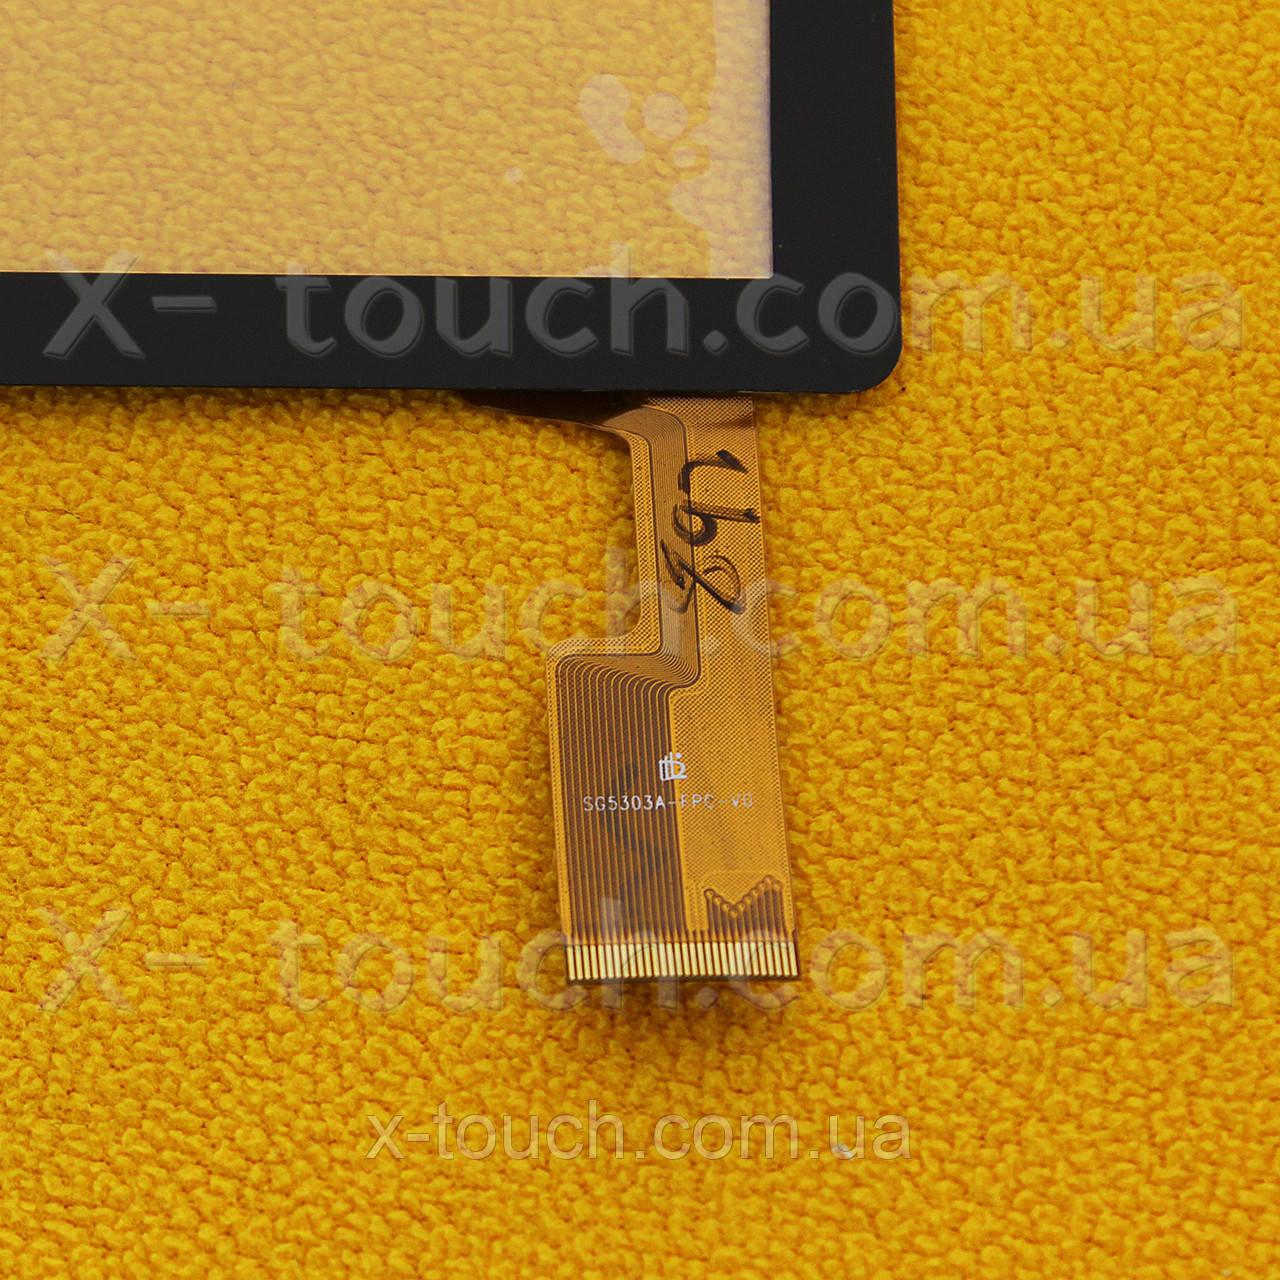 Тачскрин, сенсор  DST130426-1  для планшета